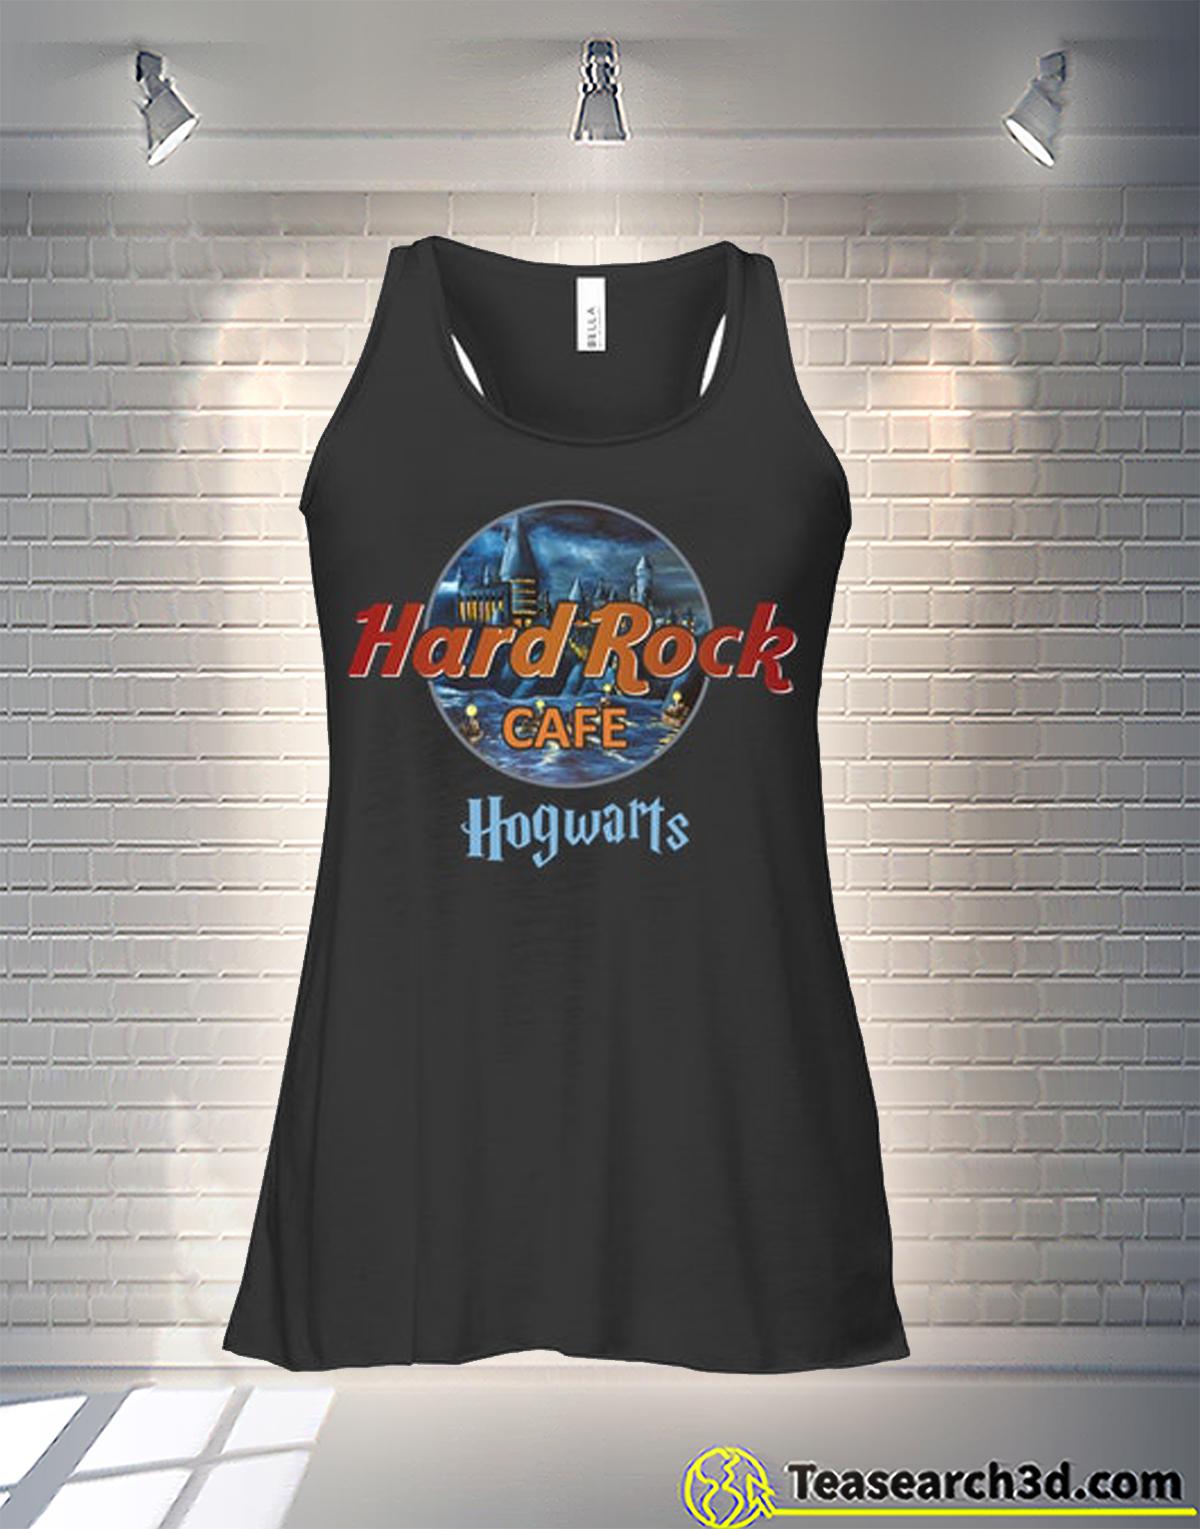 Hard rock cafe hogwarts flowy tank